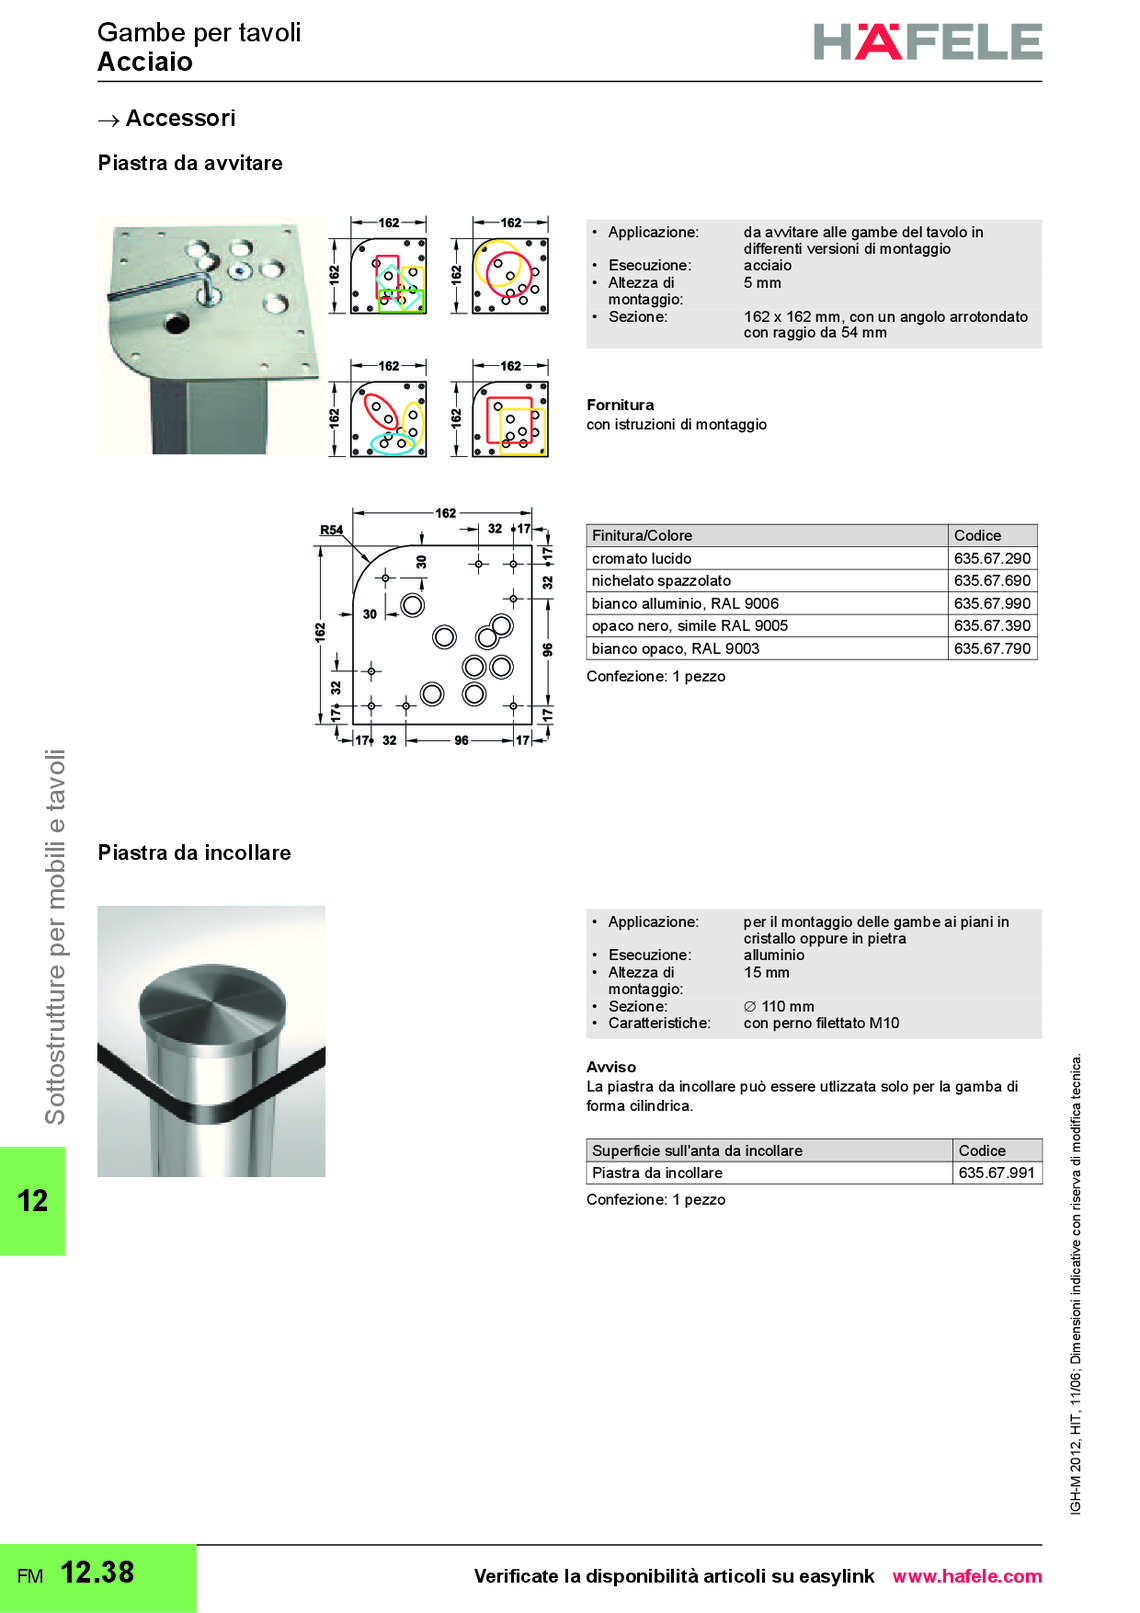 hafele-sottostrutture-per-mobili_83_061.jpg